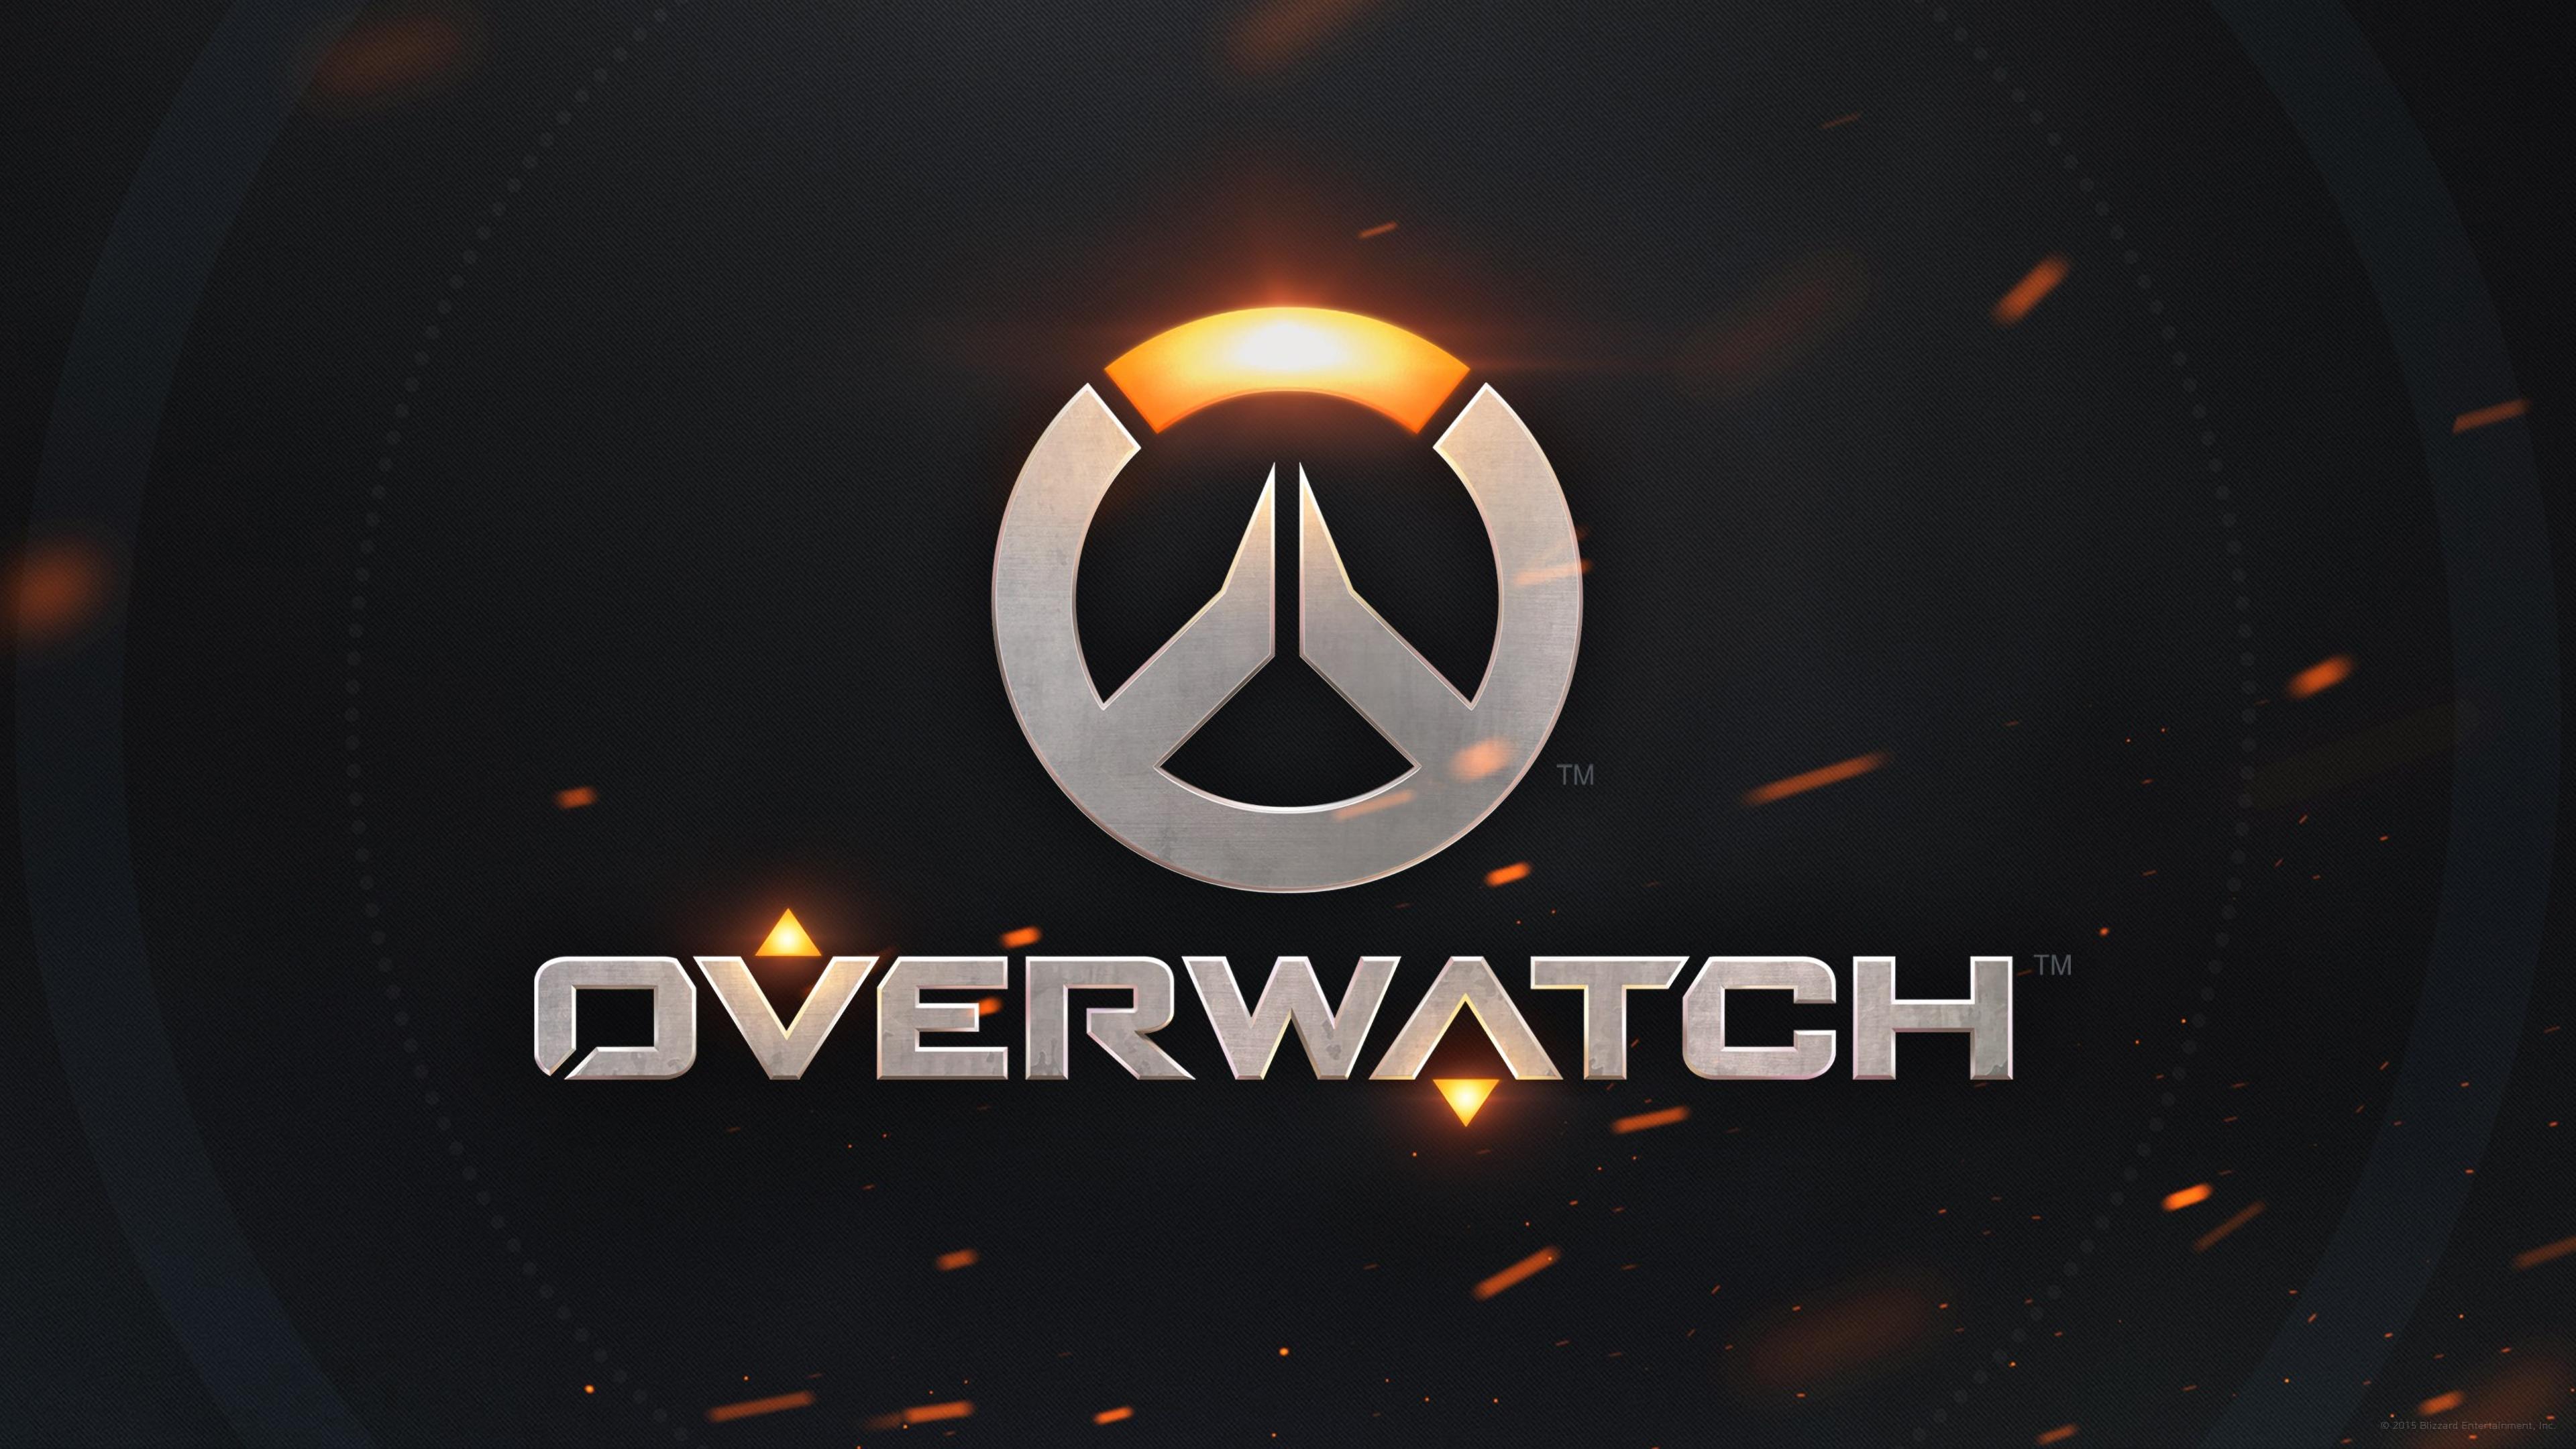 Video Game Overwatch Logo Hd Wallpaper Overwatch Wallpapers Overwatch Game Logo